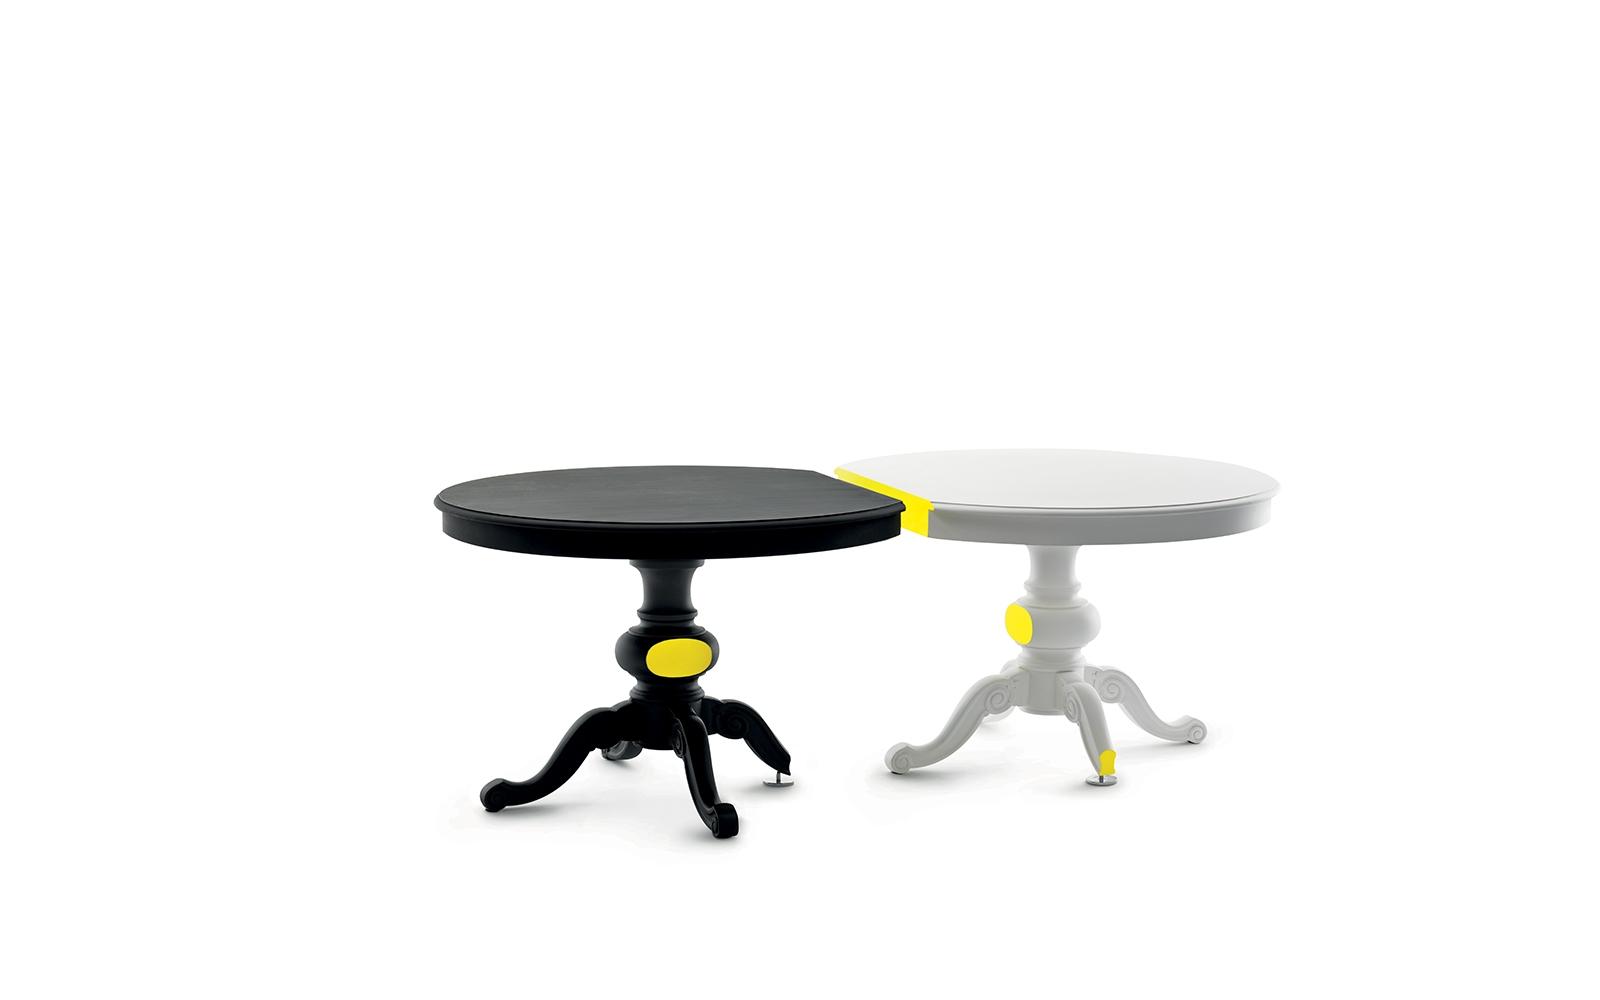 mogg_chezphilippe_table_02.jpg